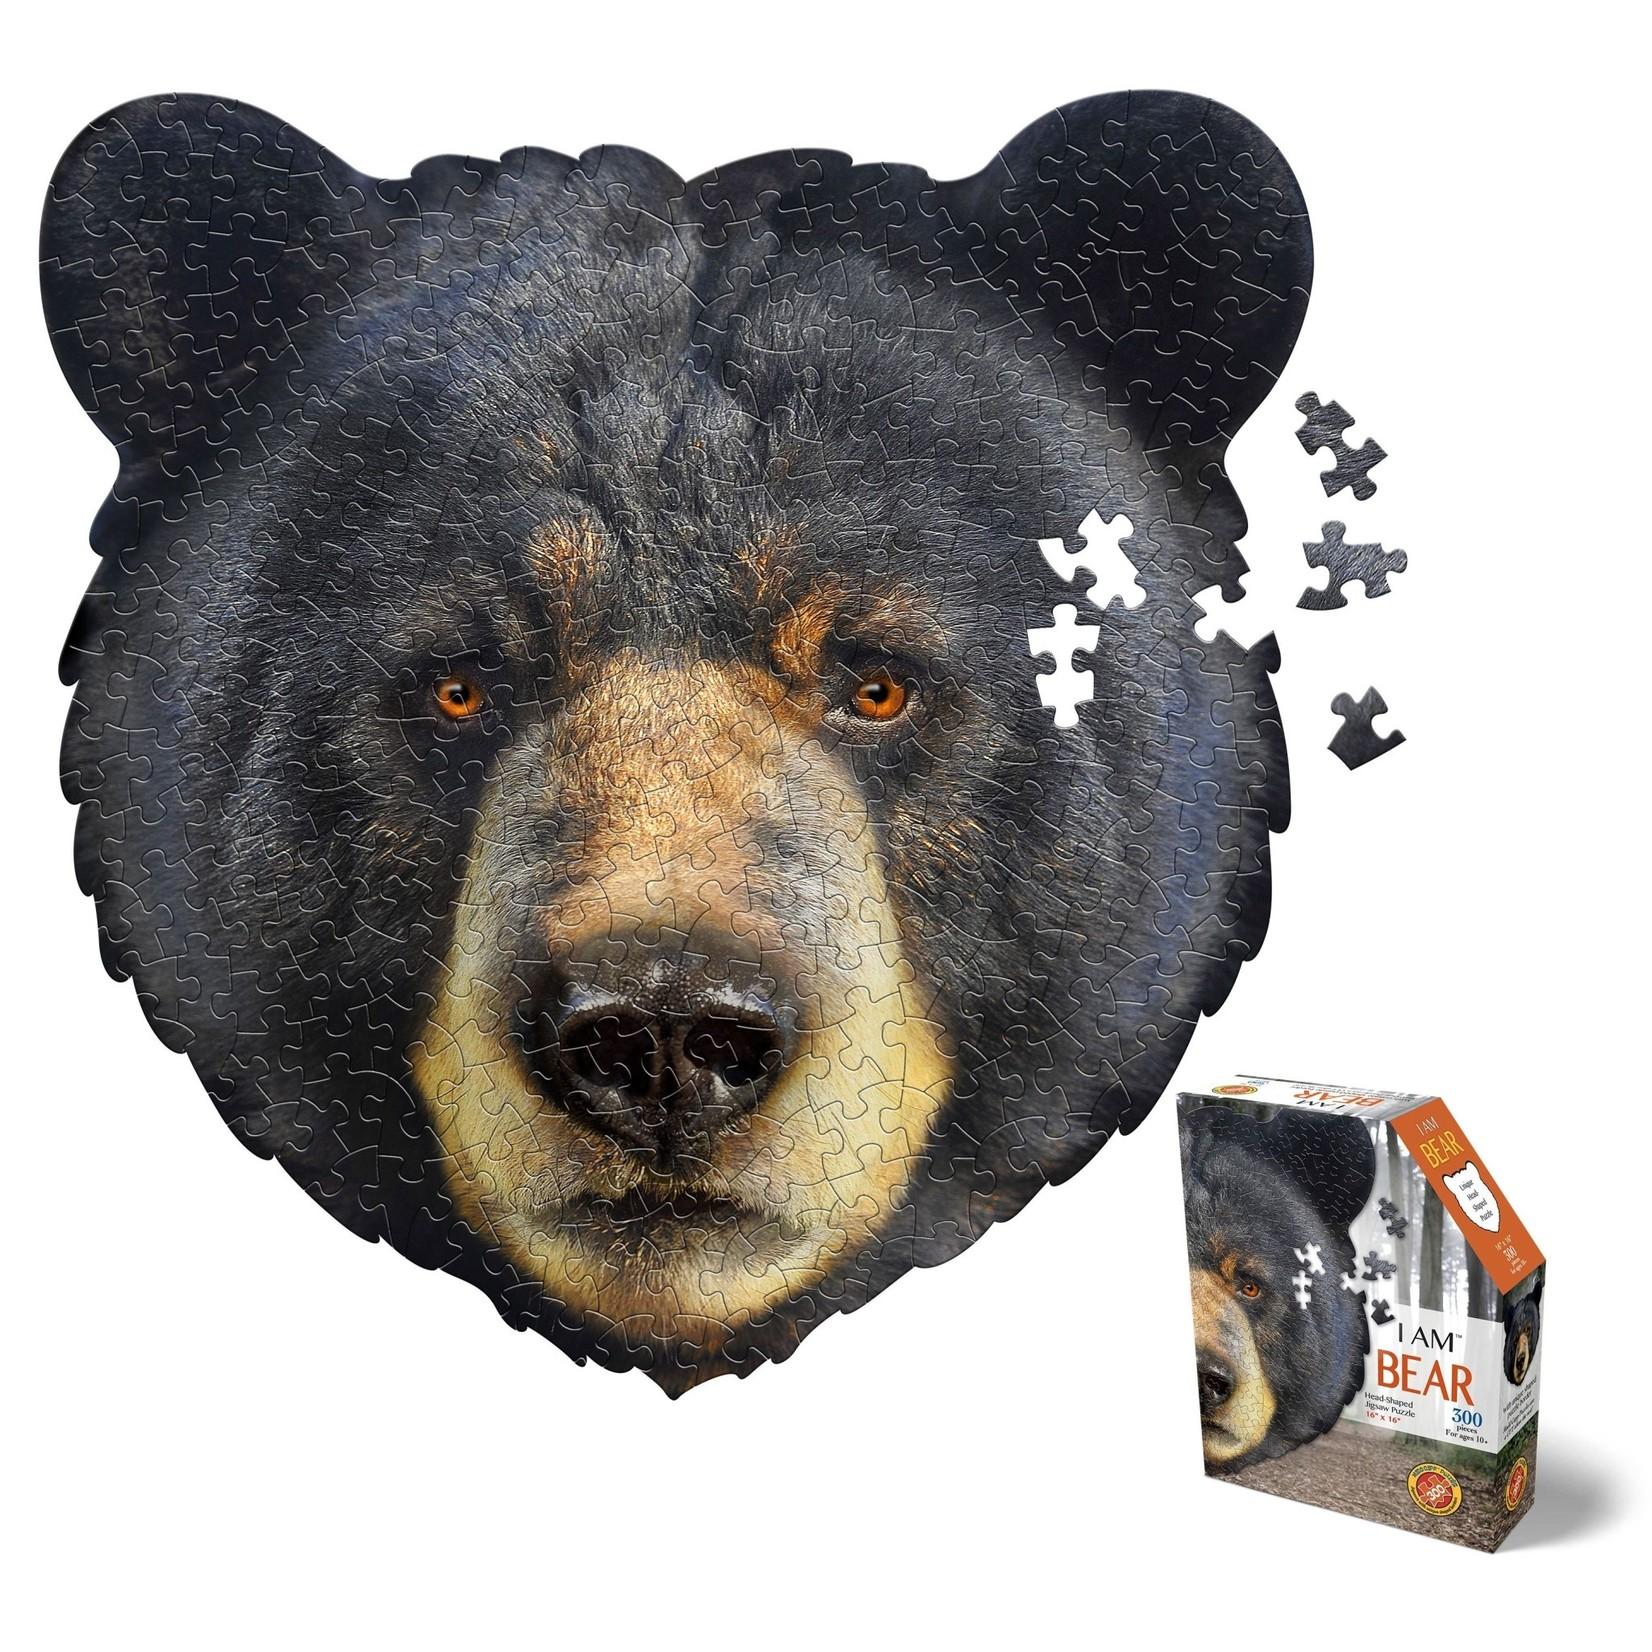 Madd Capp Games & Puzzles Madd Capp Puzzle 300pc I AM Bear